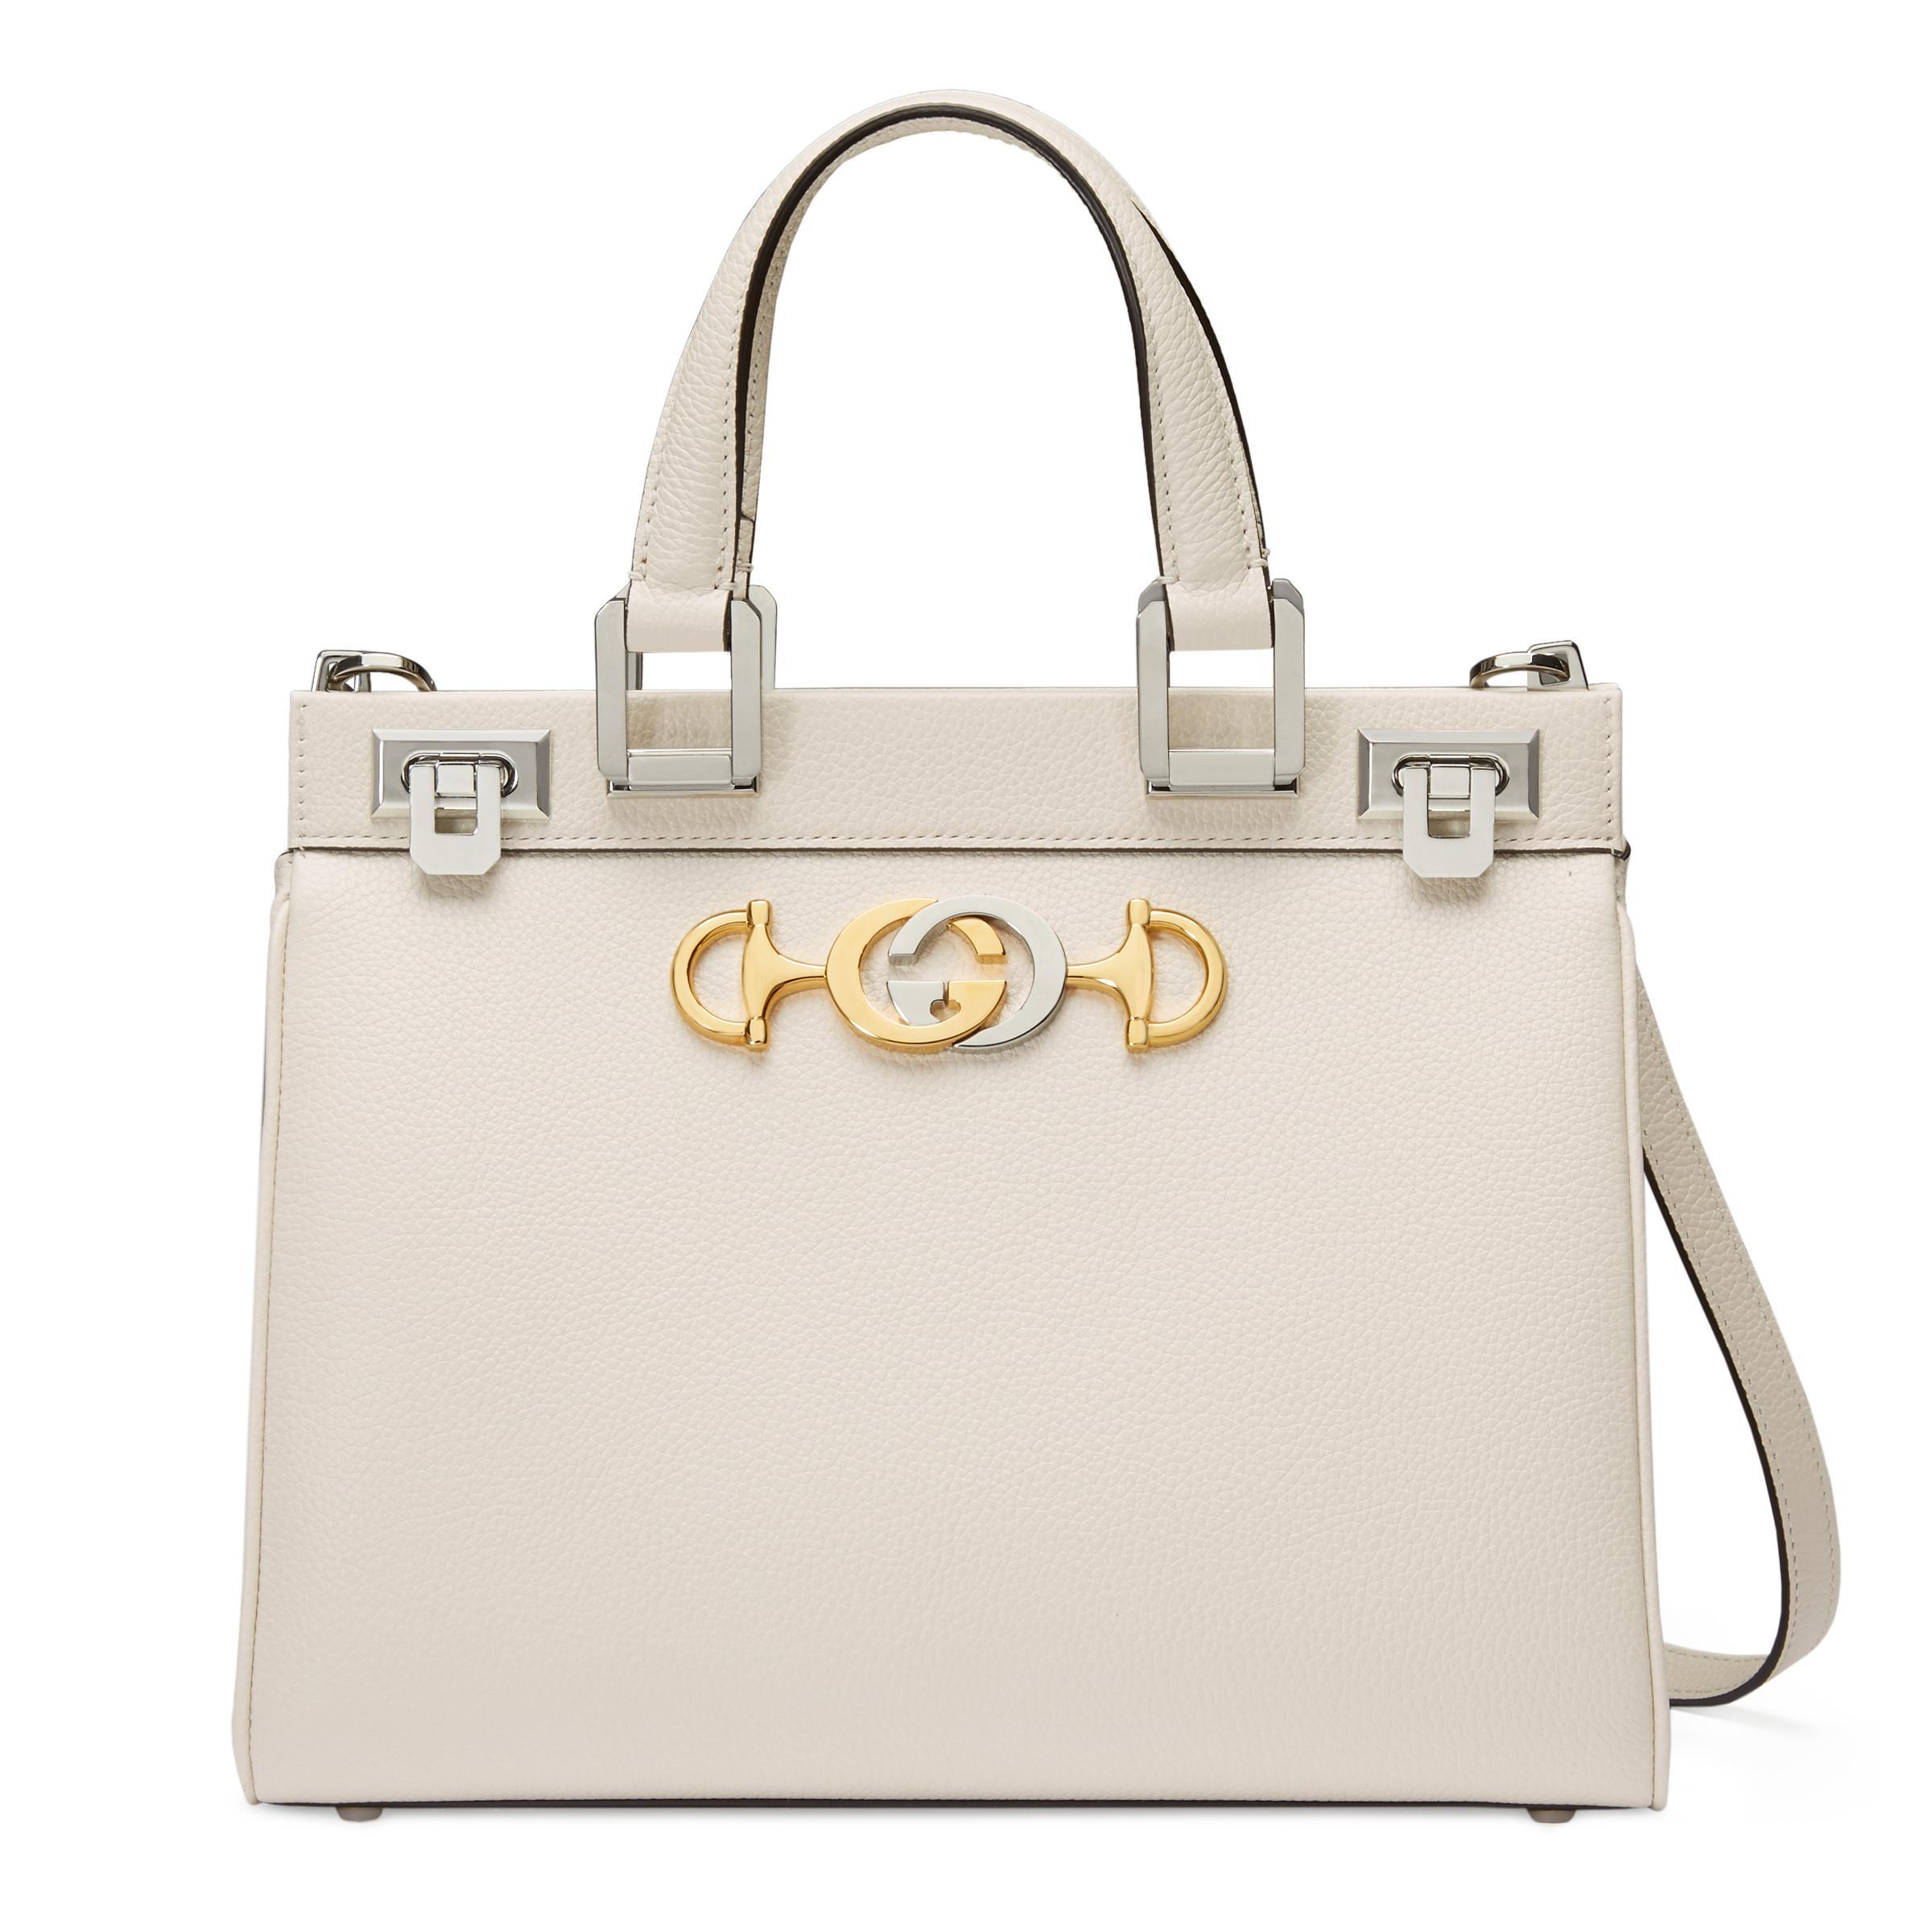 494429eb34 Women's White Zumi Small Top Handle Bag